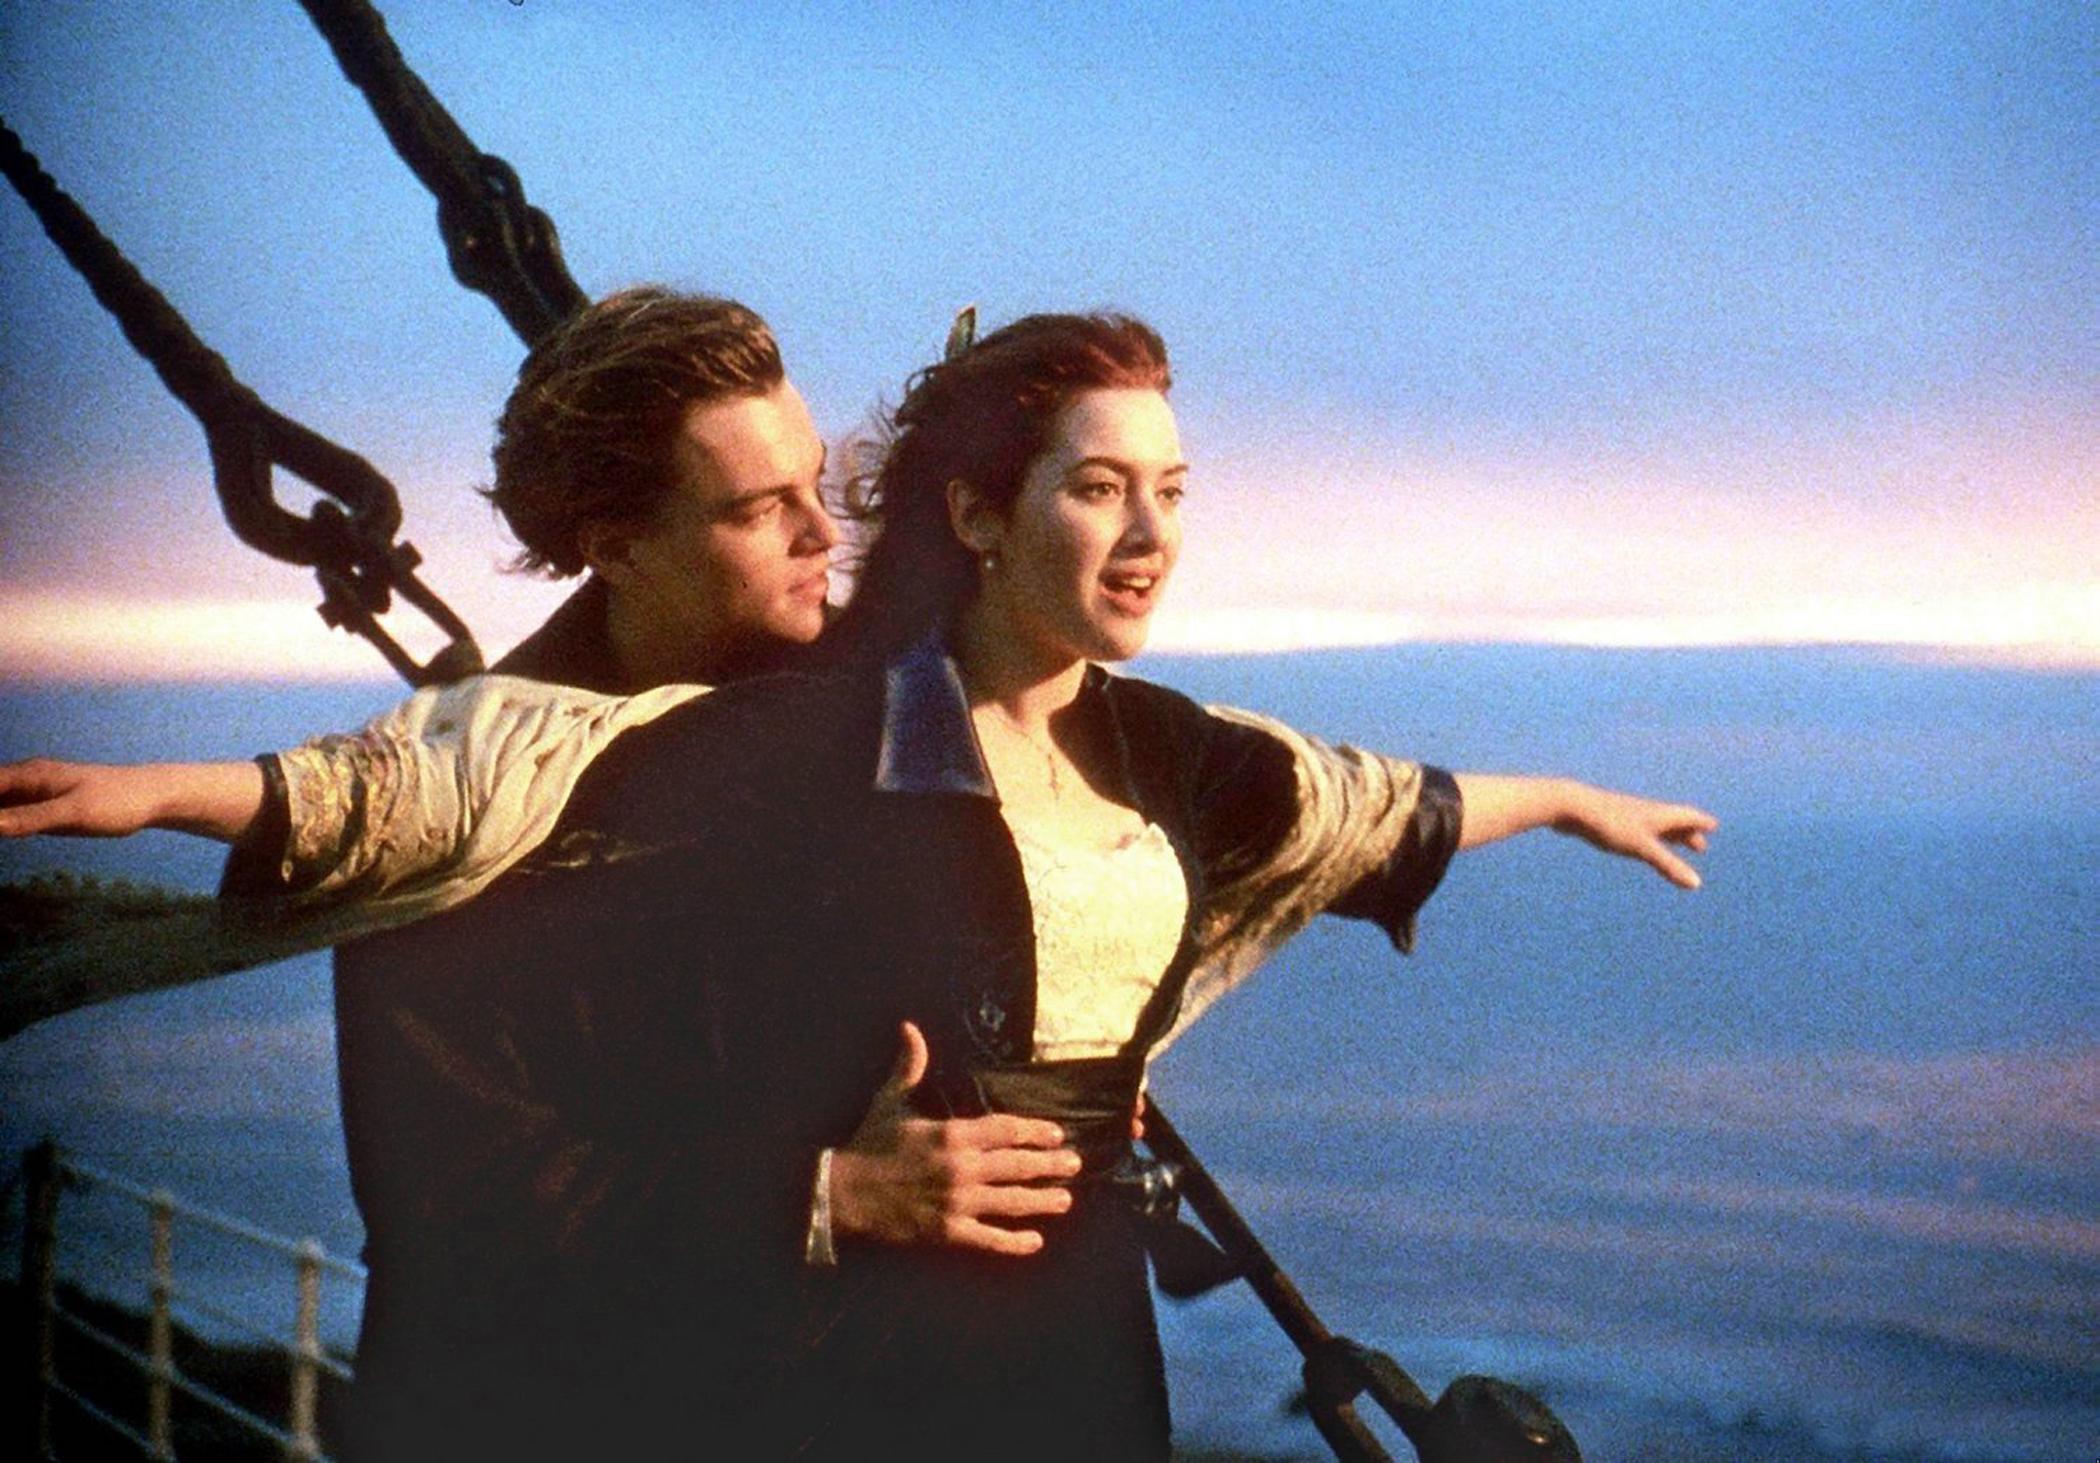 Rose DeWitt Bukater in Titanic, 1997.